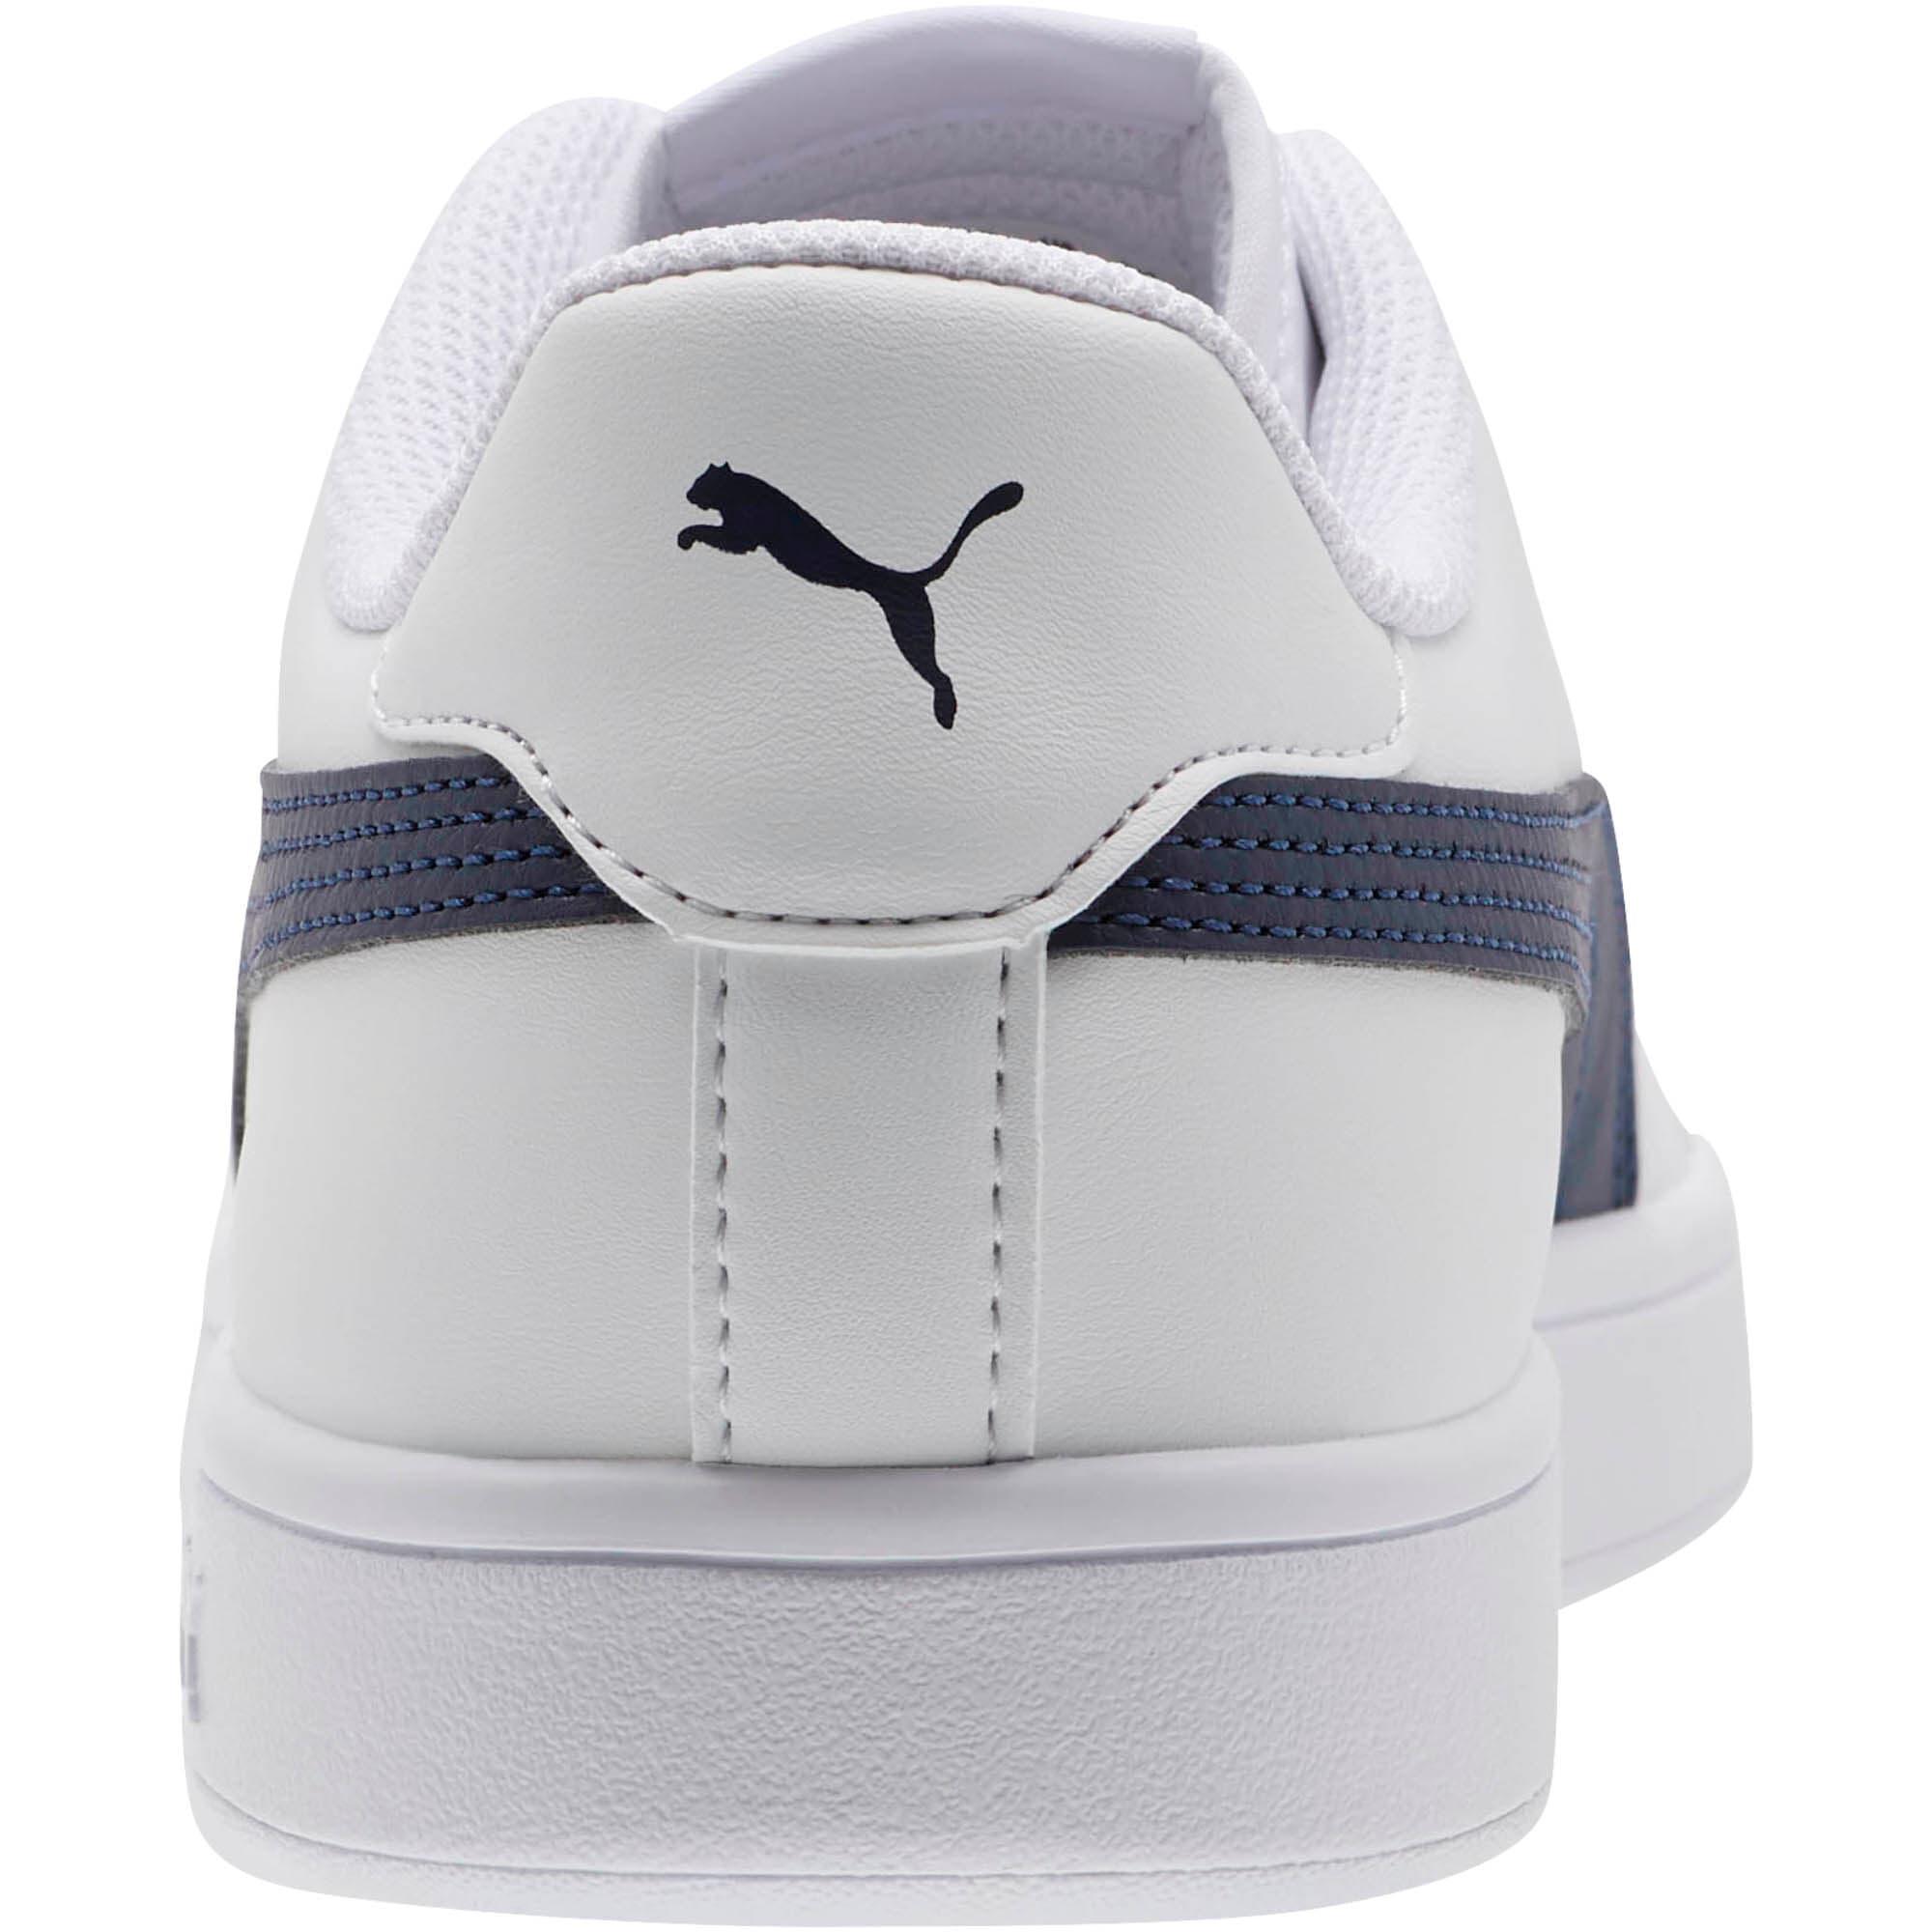 Thumbnail 3 of PUMA Smash v2 Sneakers, Puma White-Peacoat, medium